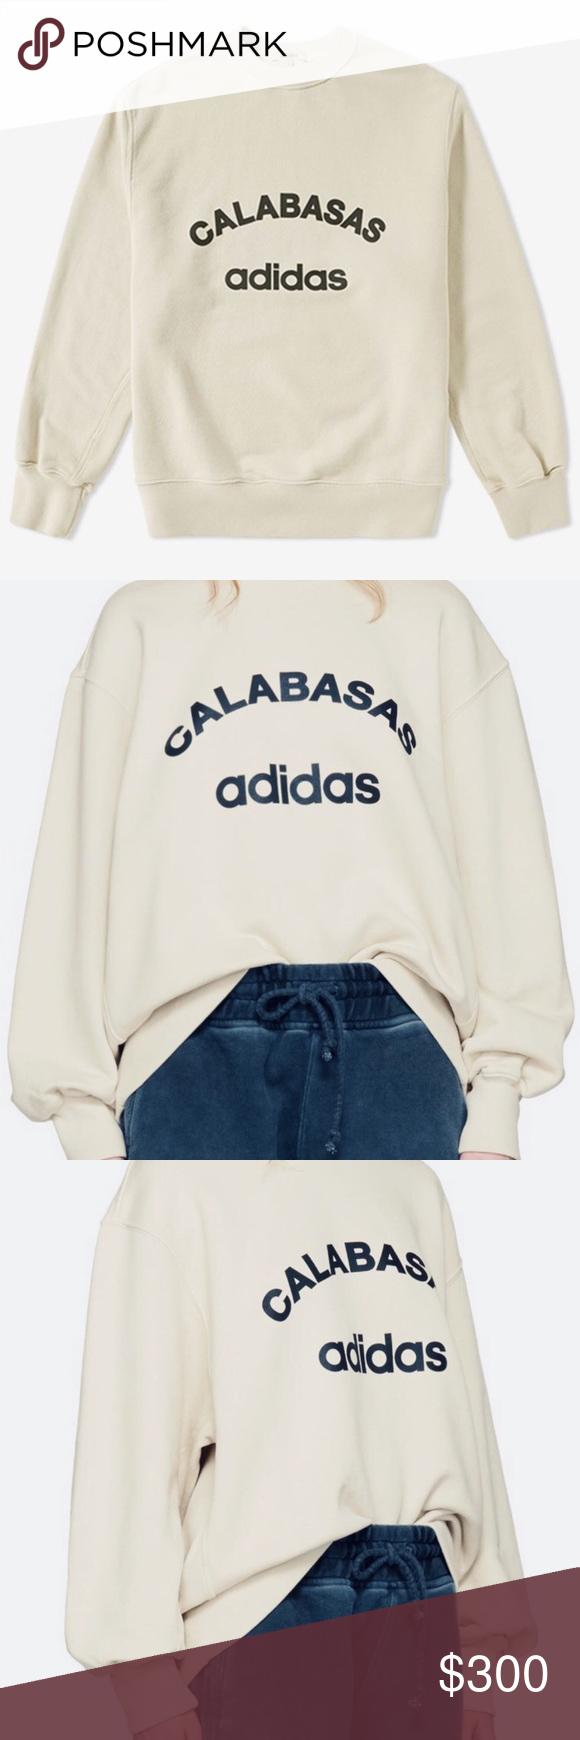 Yeezy Season 5 X Adidas Calabasas Sweatshirt Authentic Yeezy Season 5 Jupiter Calabasas Adidas Crewneck Sweatsh Sweatshirts Yeezy Shirt Sweatshirts Hoodie [ 1740 x 580 Pixel ]